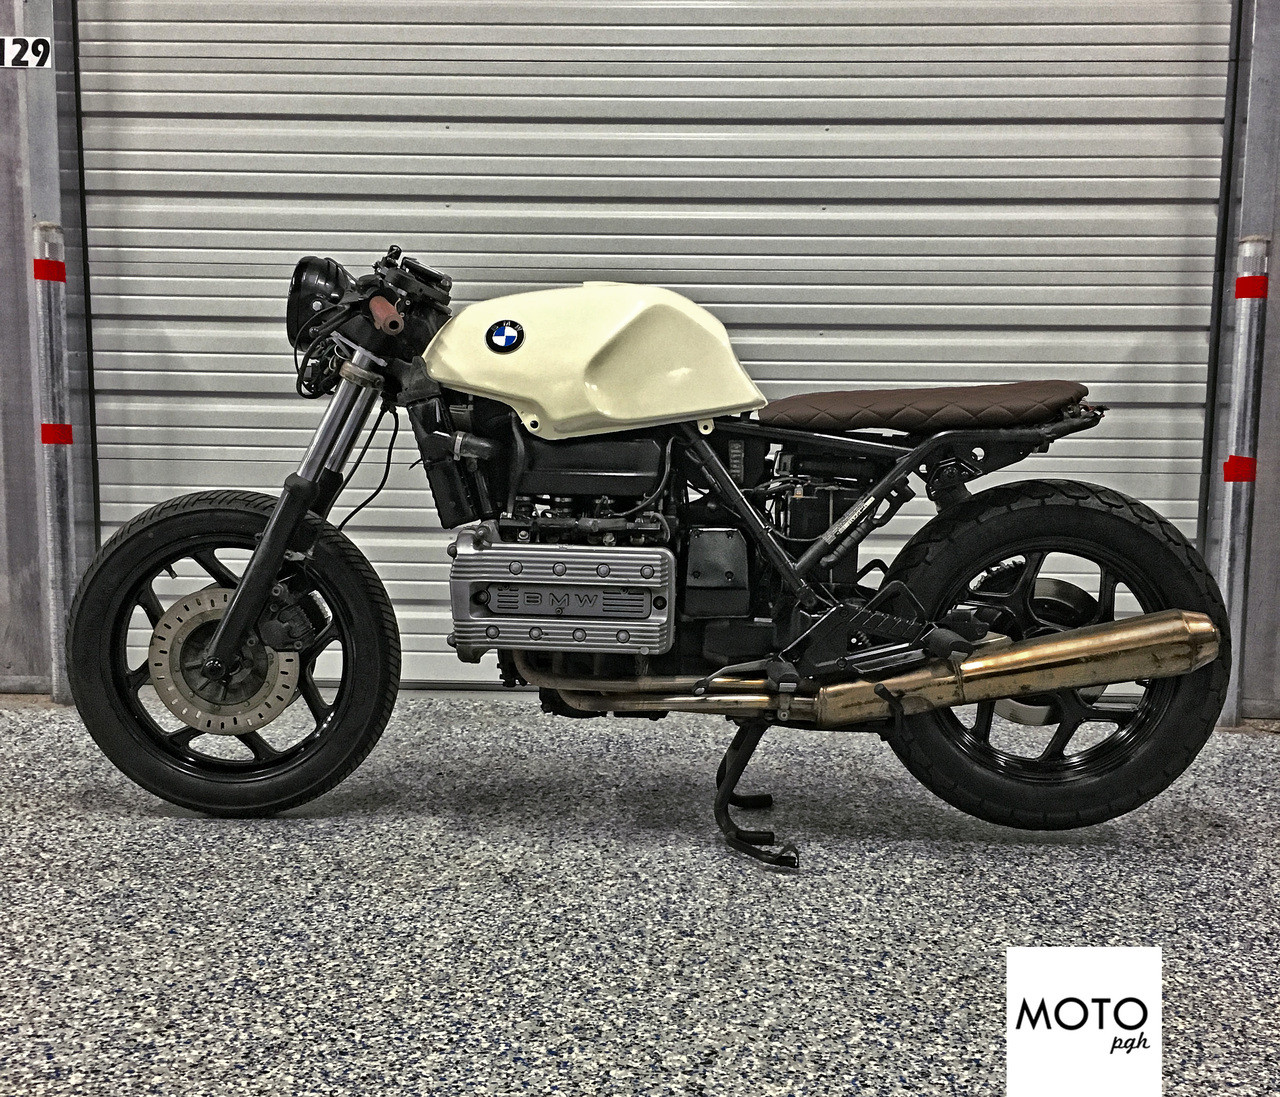 Sold 973 Bmw K100 The Brick Brat Cafe Racer Moto Pgh